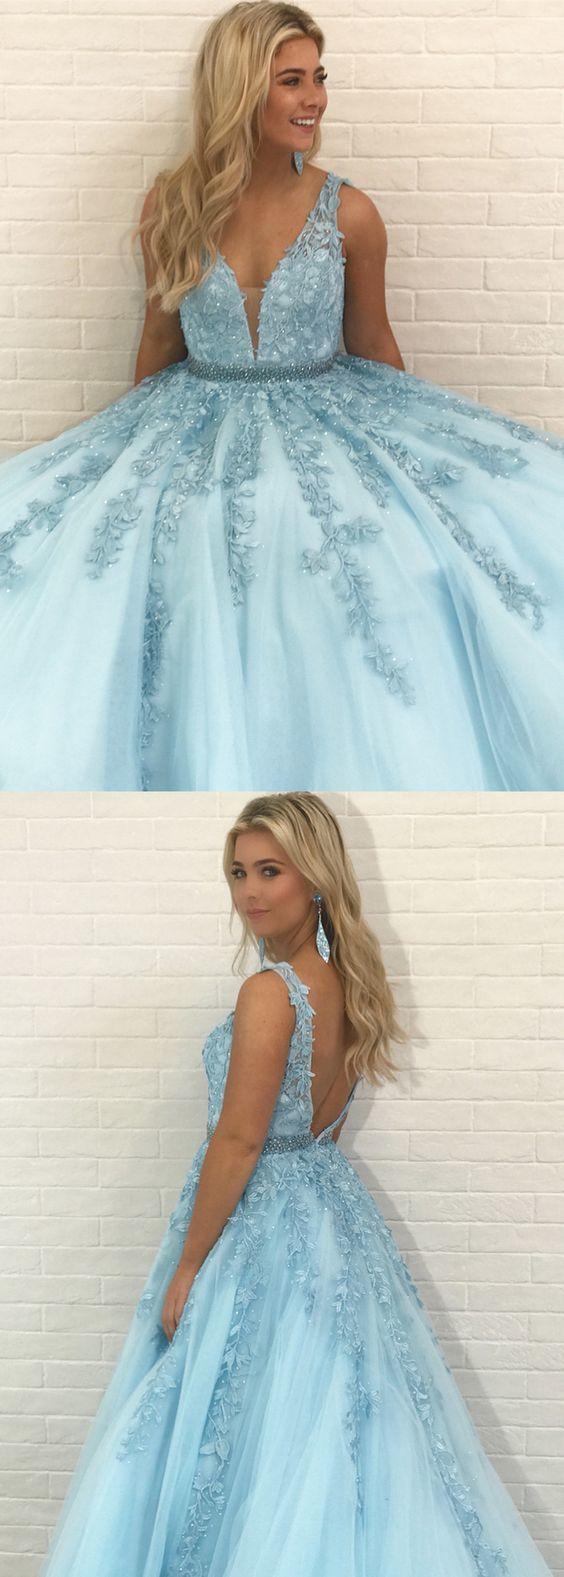 Gorgeous V Neck Blue Long Prom Dress with Lace Appliques